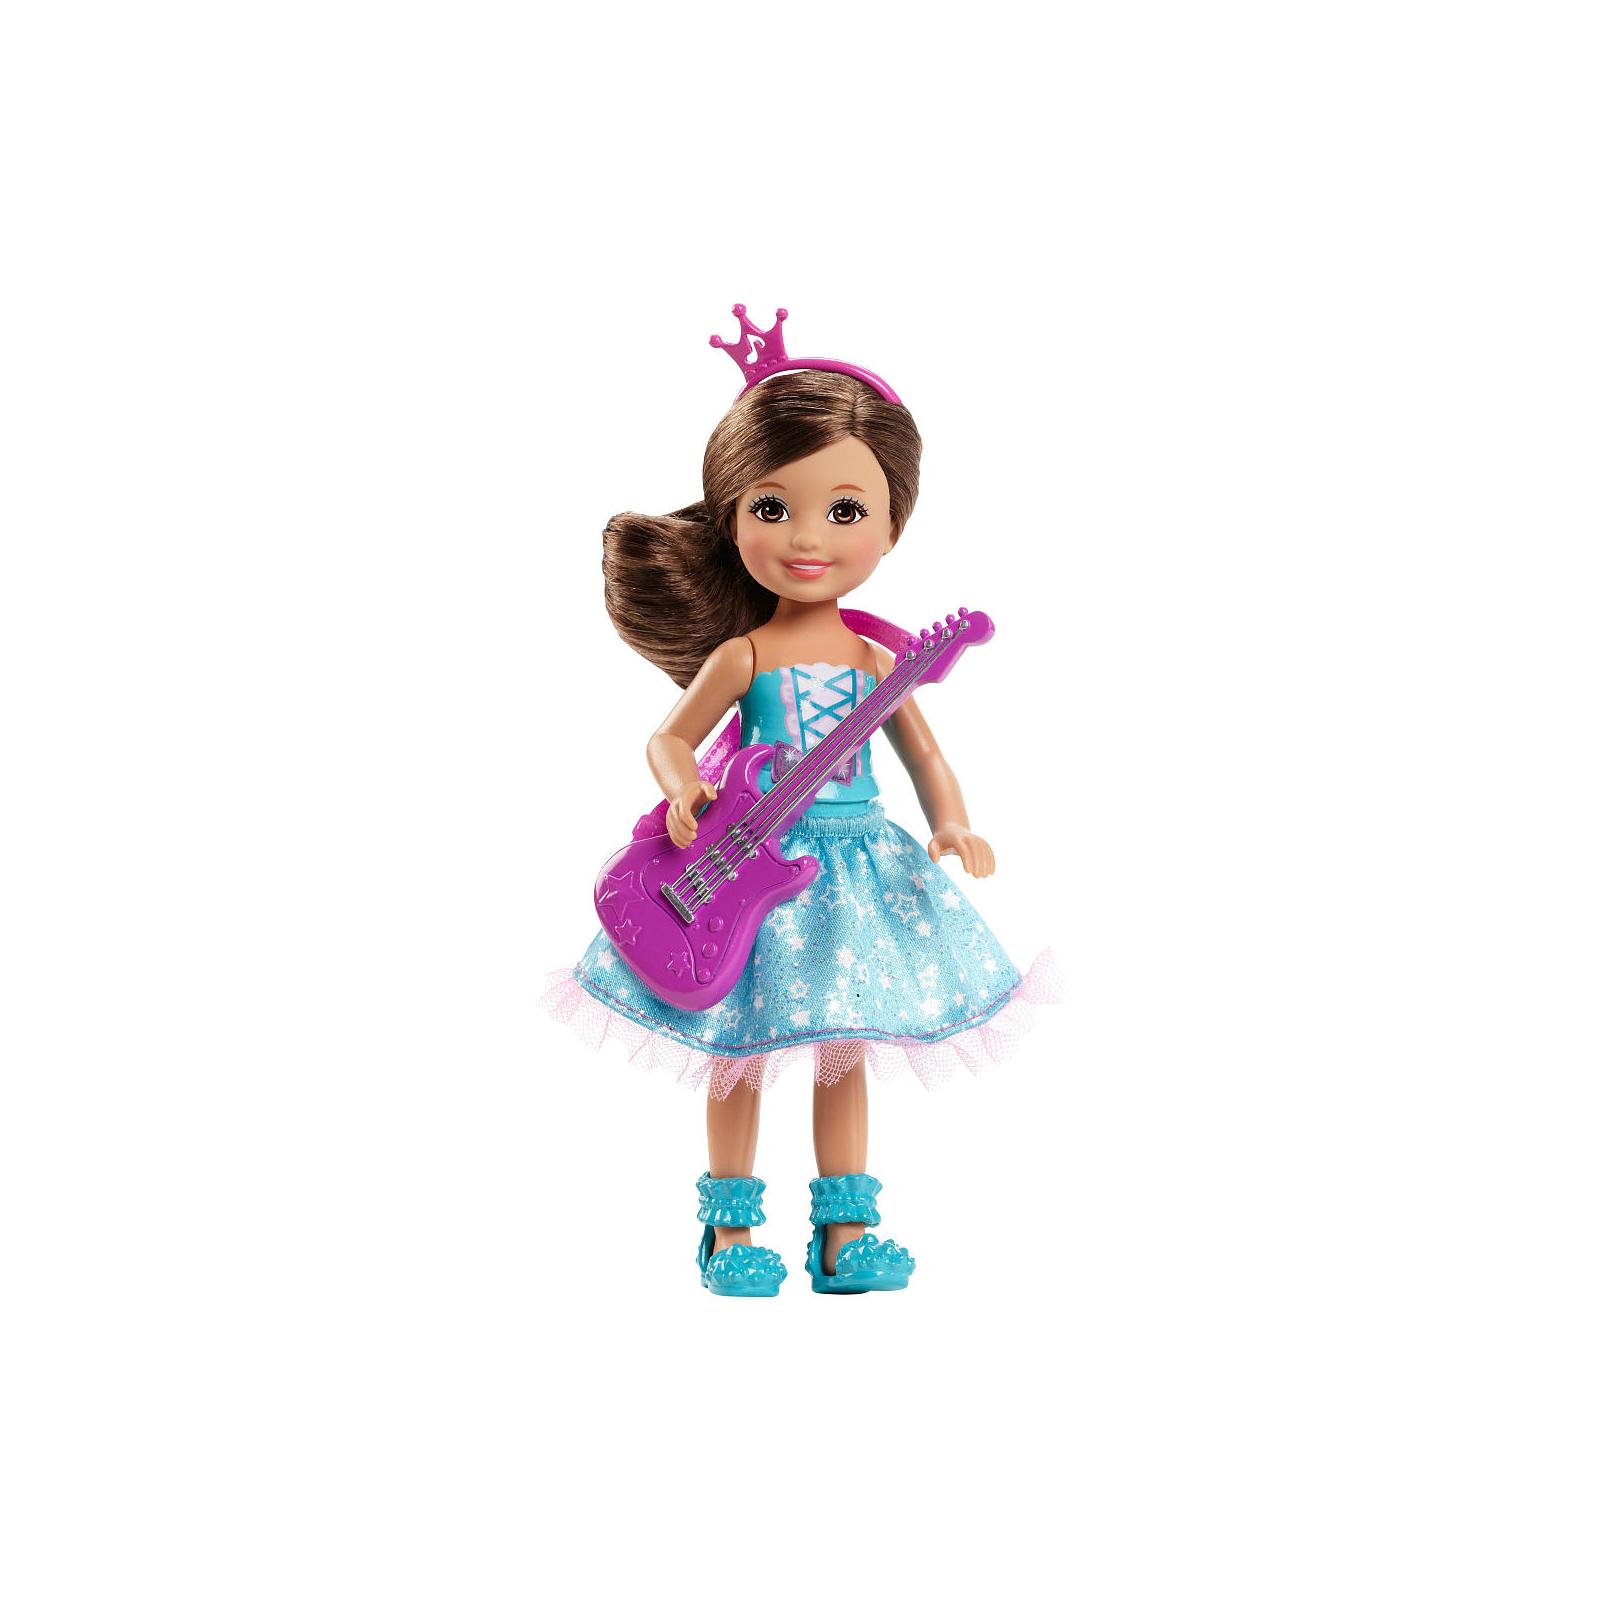 Кукла BARBIE Челси из м/ф Барби: Рок-принцесса с гитарой (CKB68-2)